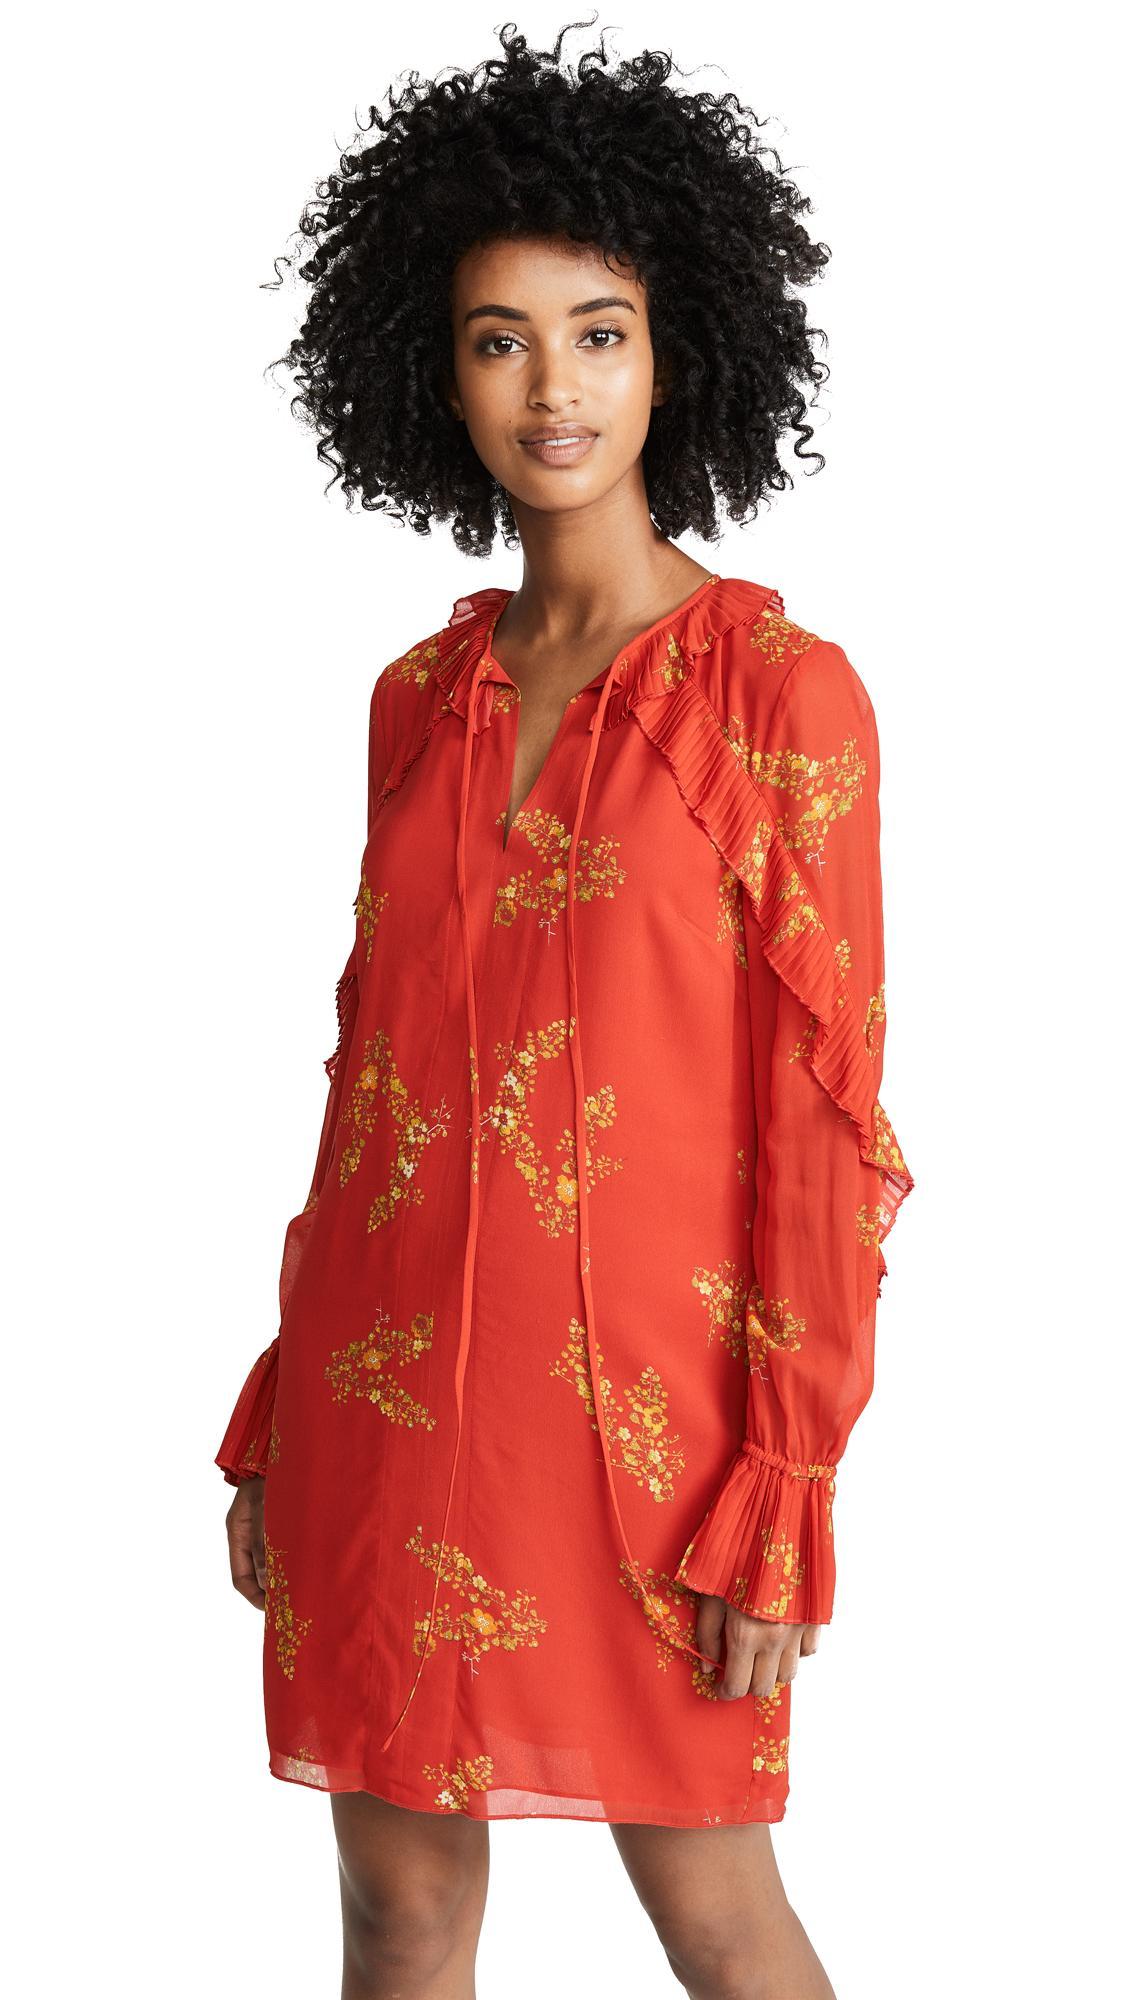 076fd050d366ba Derek Lam 10 Crosby Long Sleeve Pleated Dress In Red | ModeSens